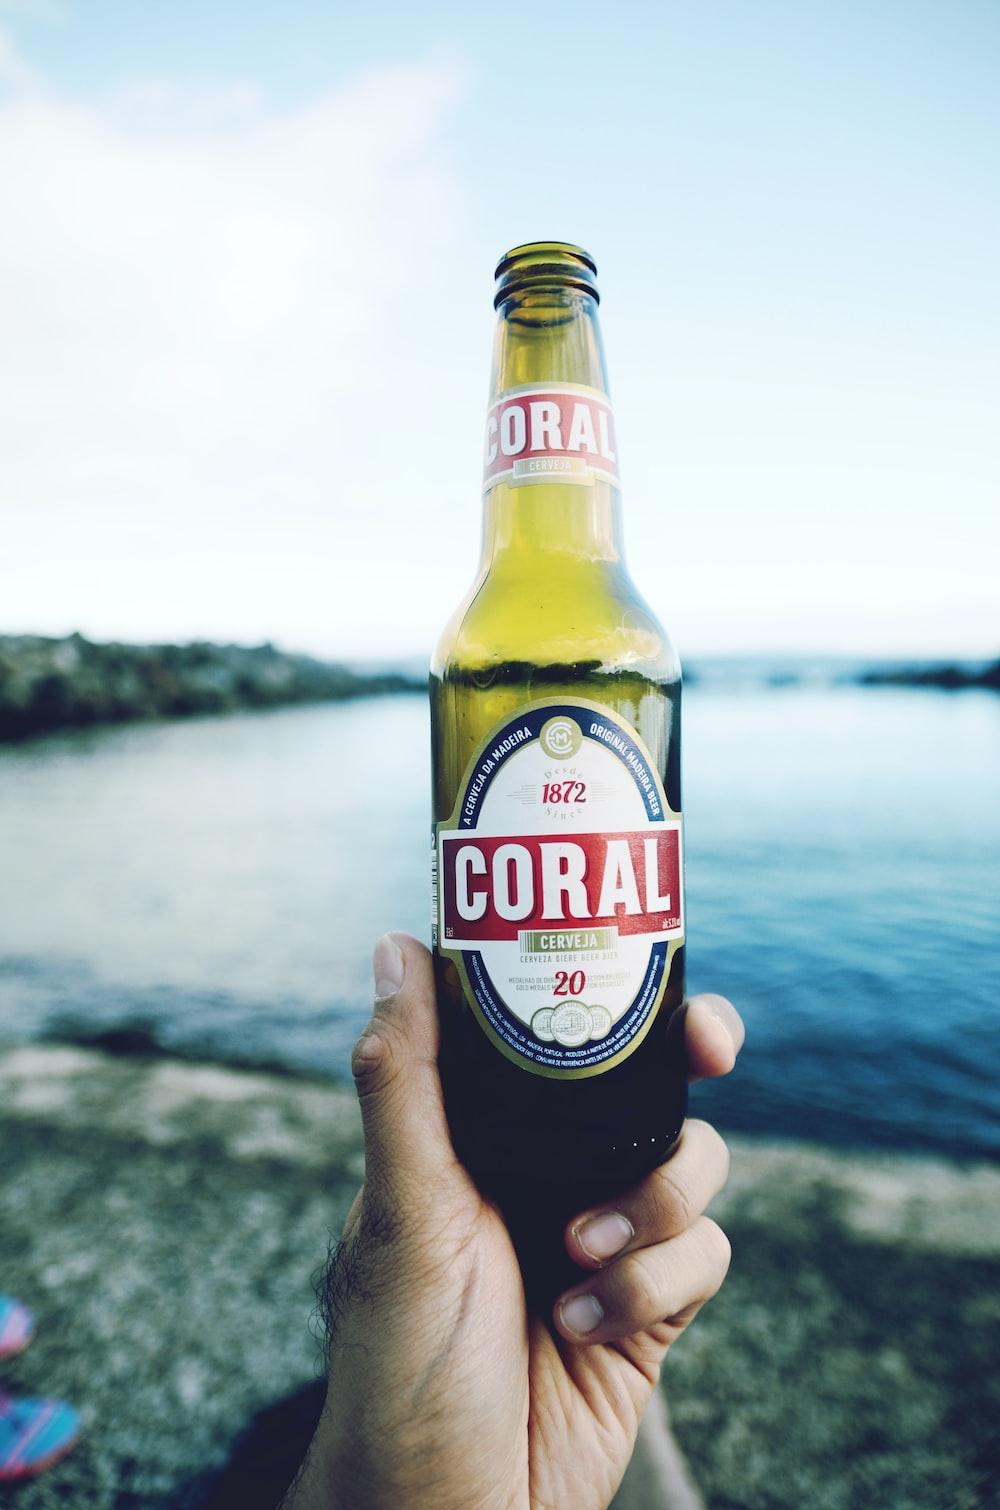 1872 Coral labeled bottle